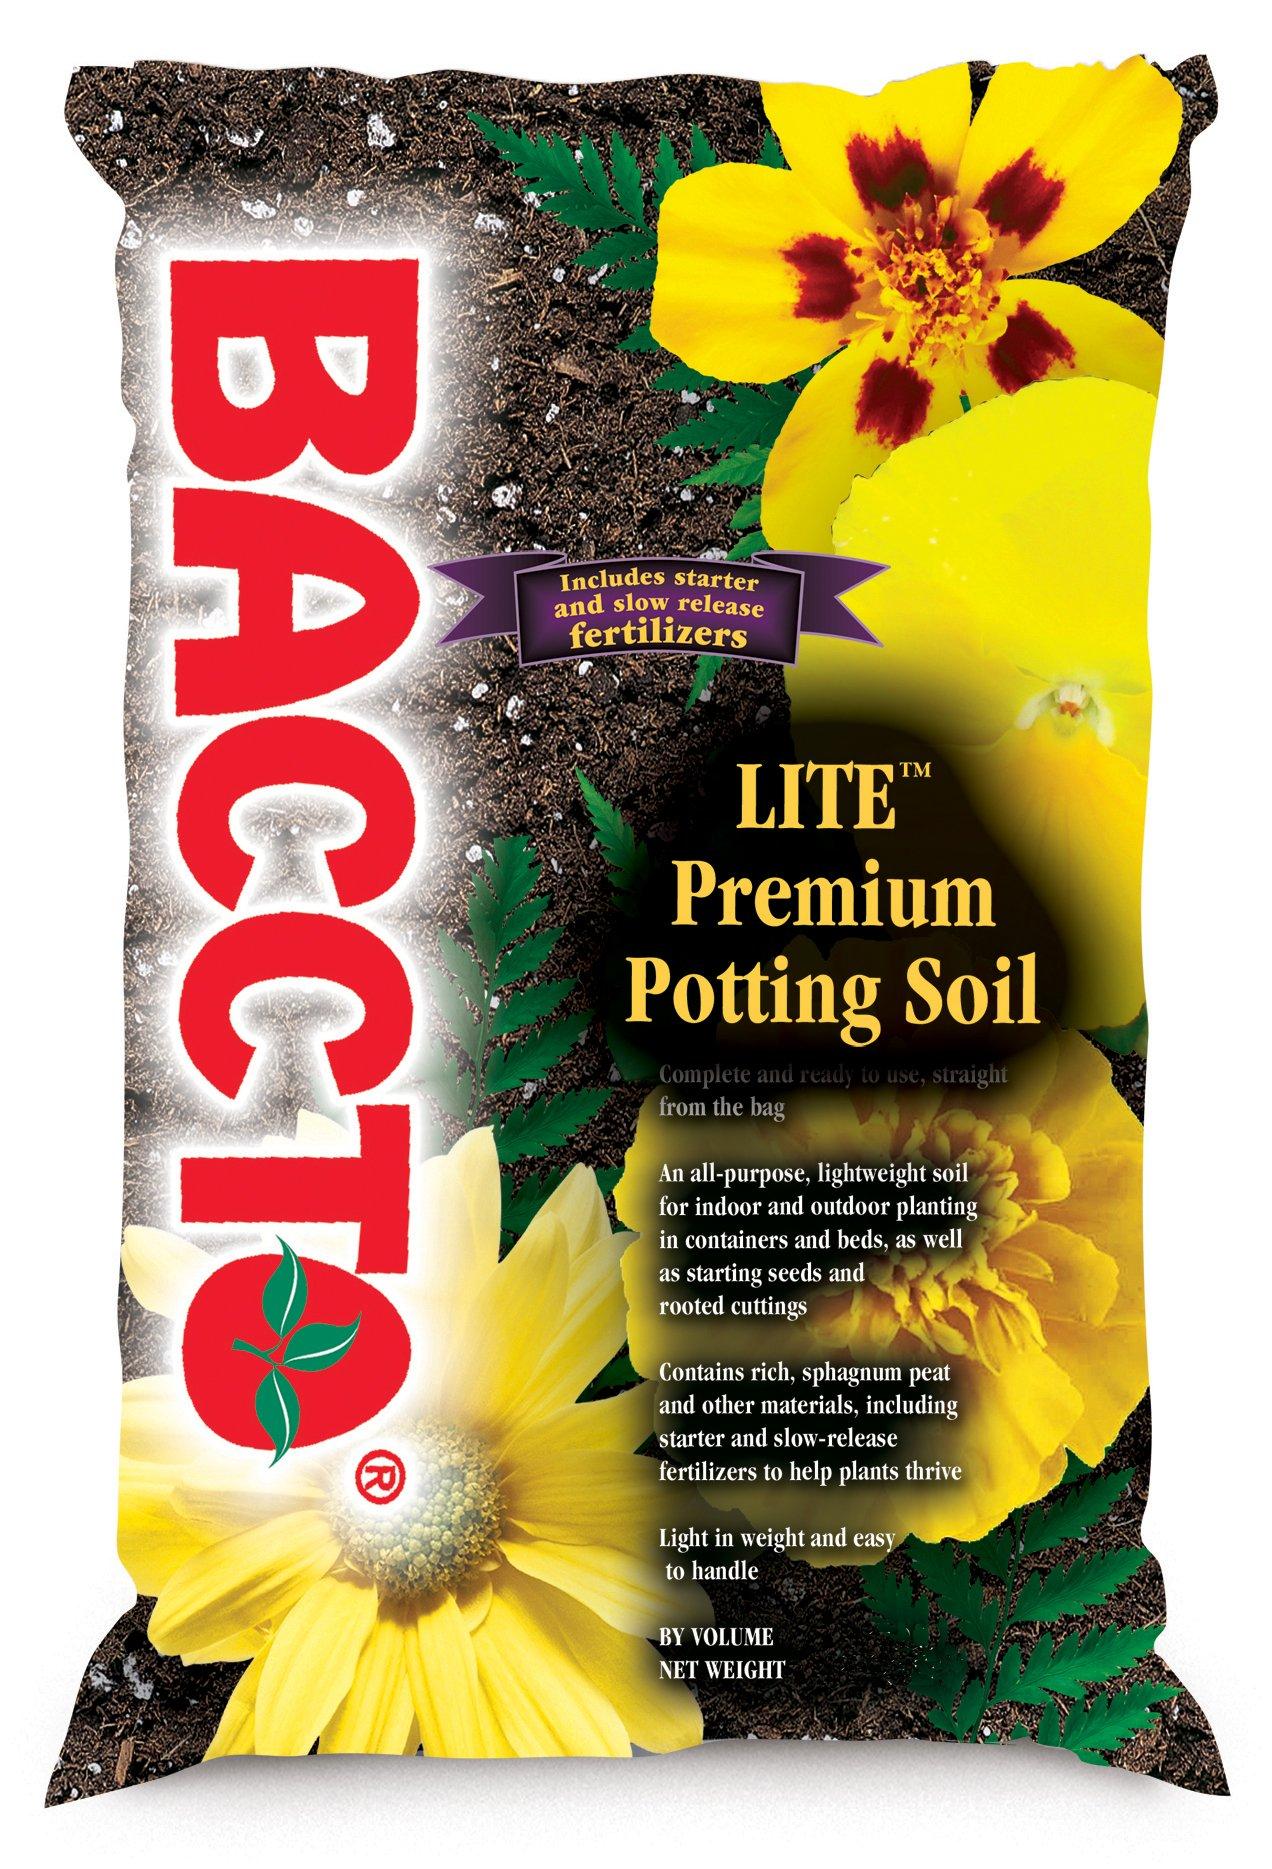 Michigan Peat 1460 Baccto Lite Premium Potting Soil, 8 Quarts